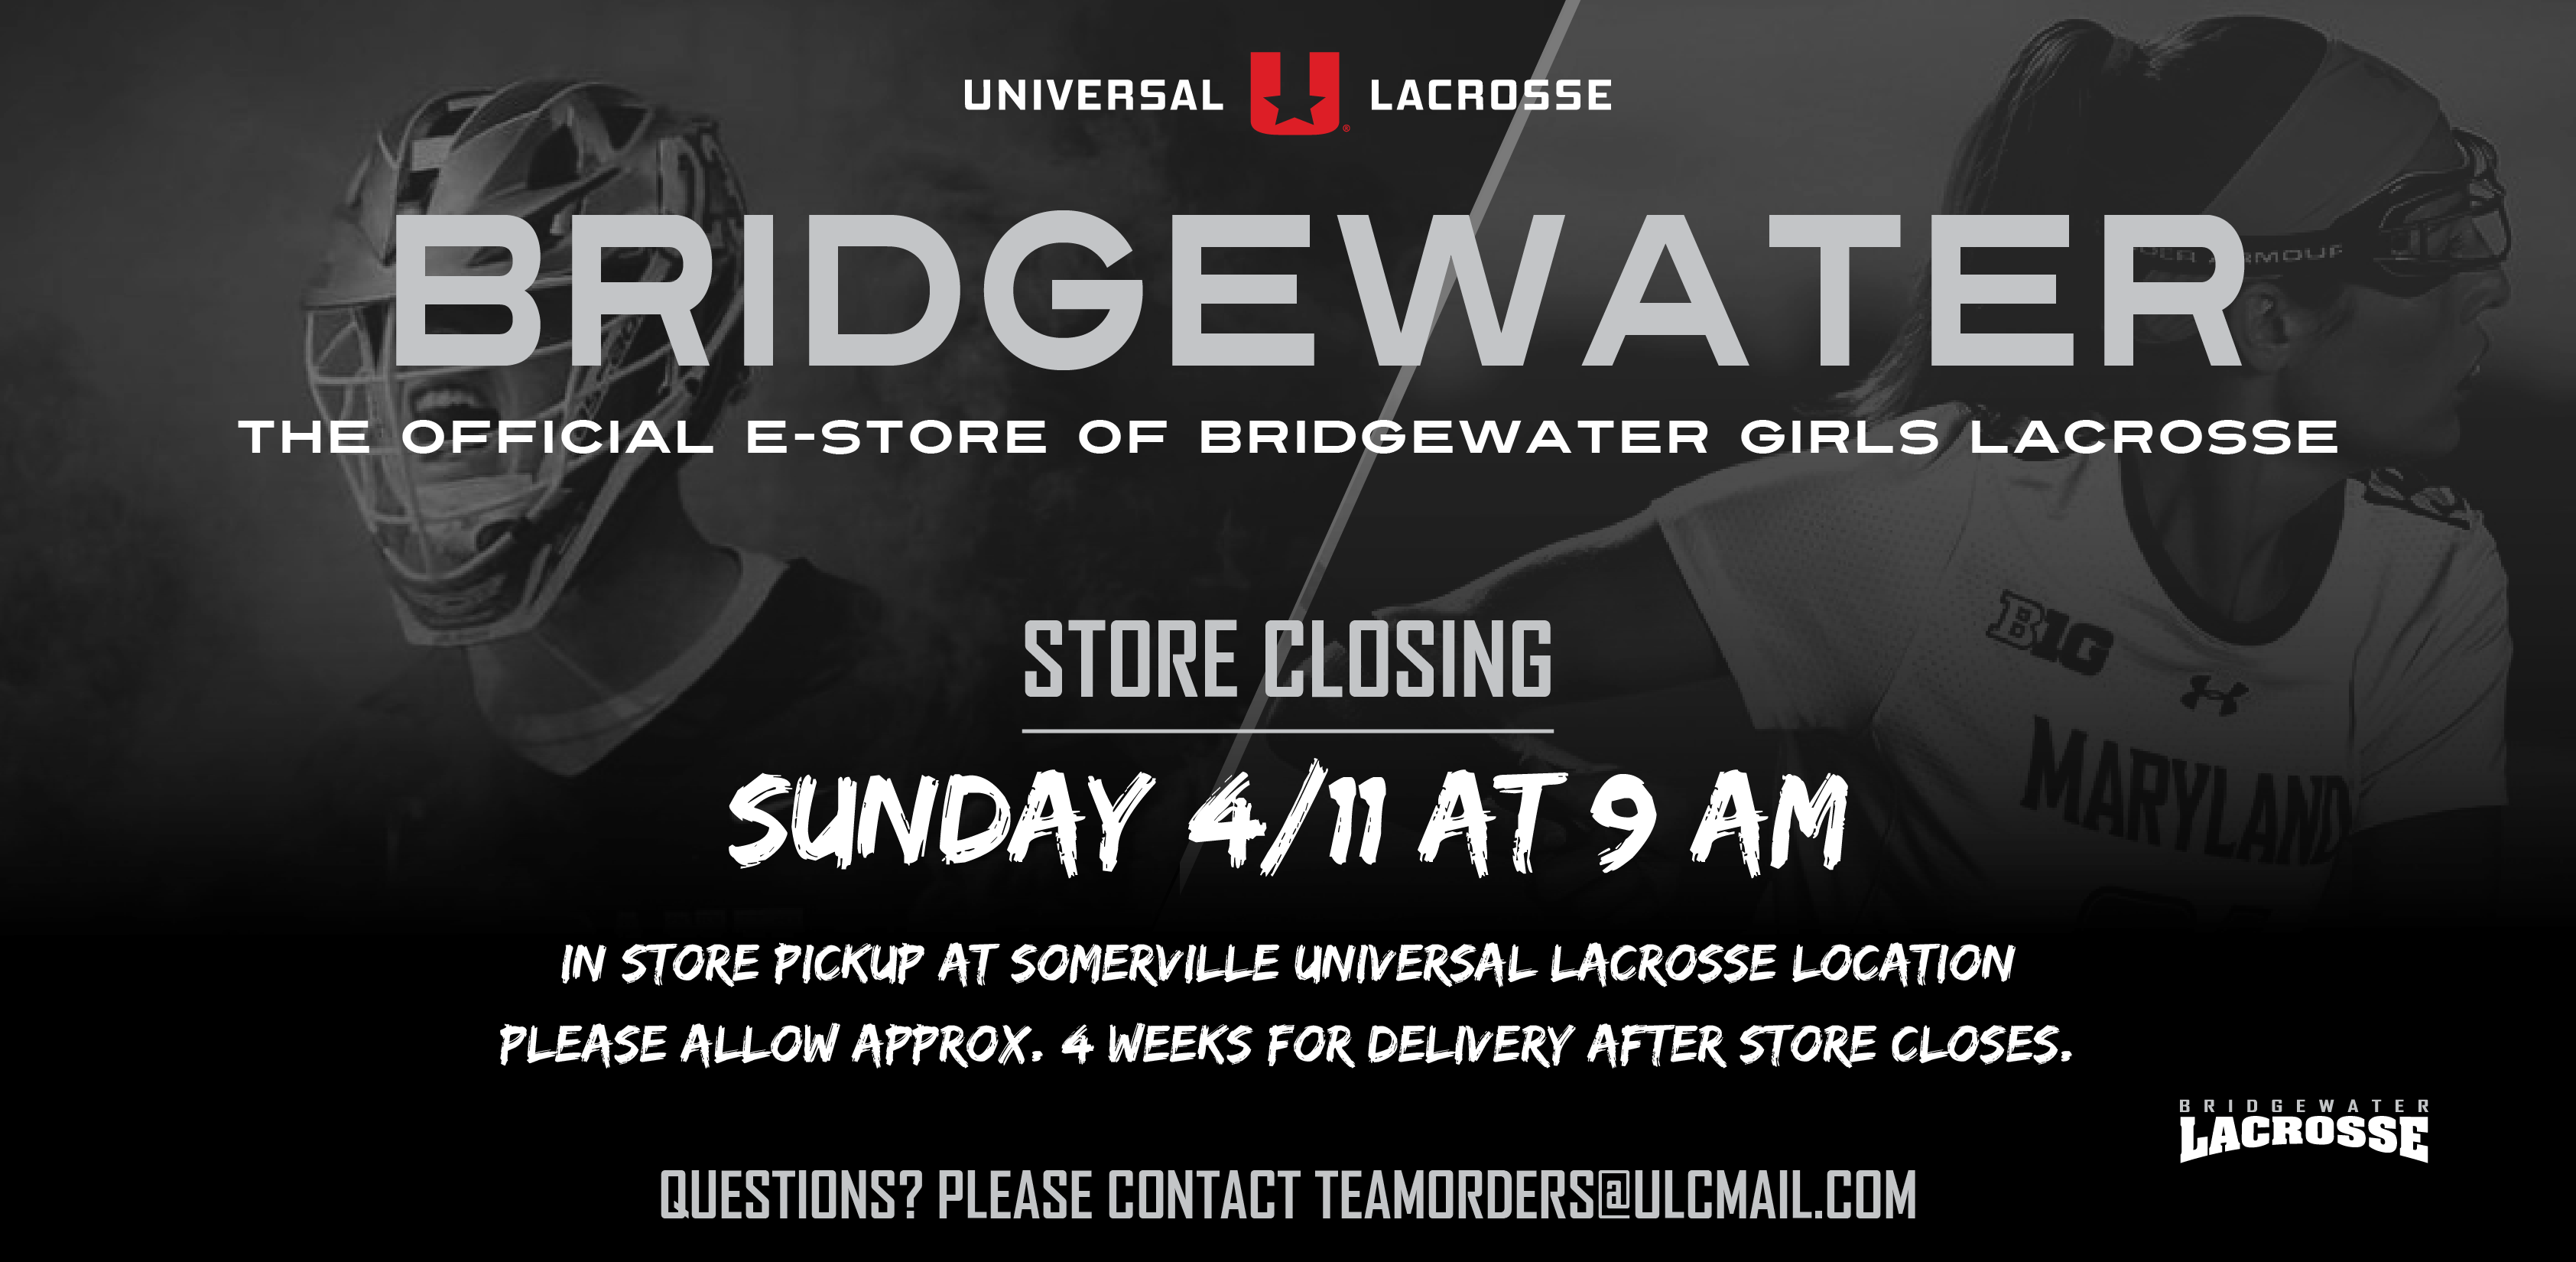 Bridgewater Girls Lacrosse